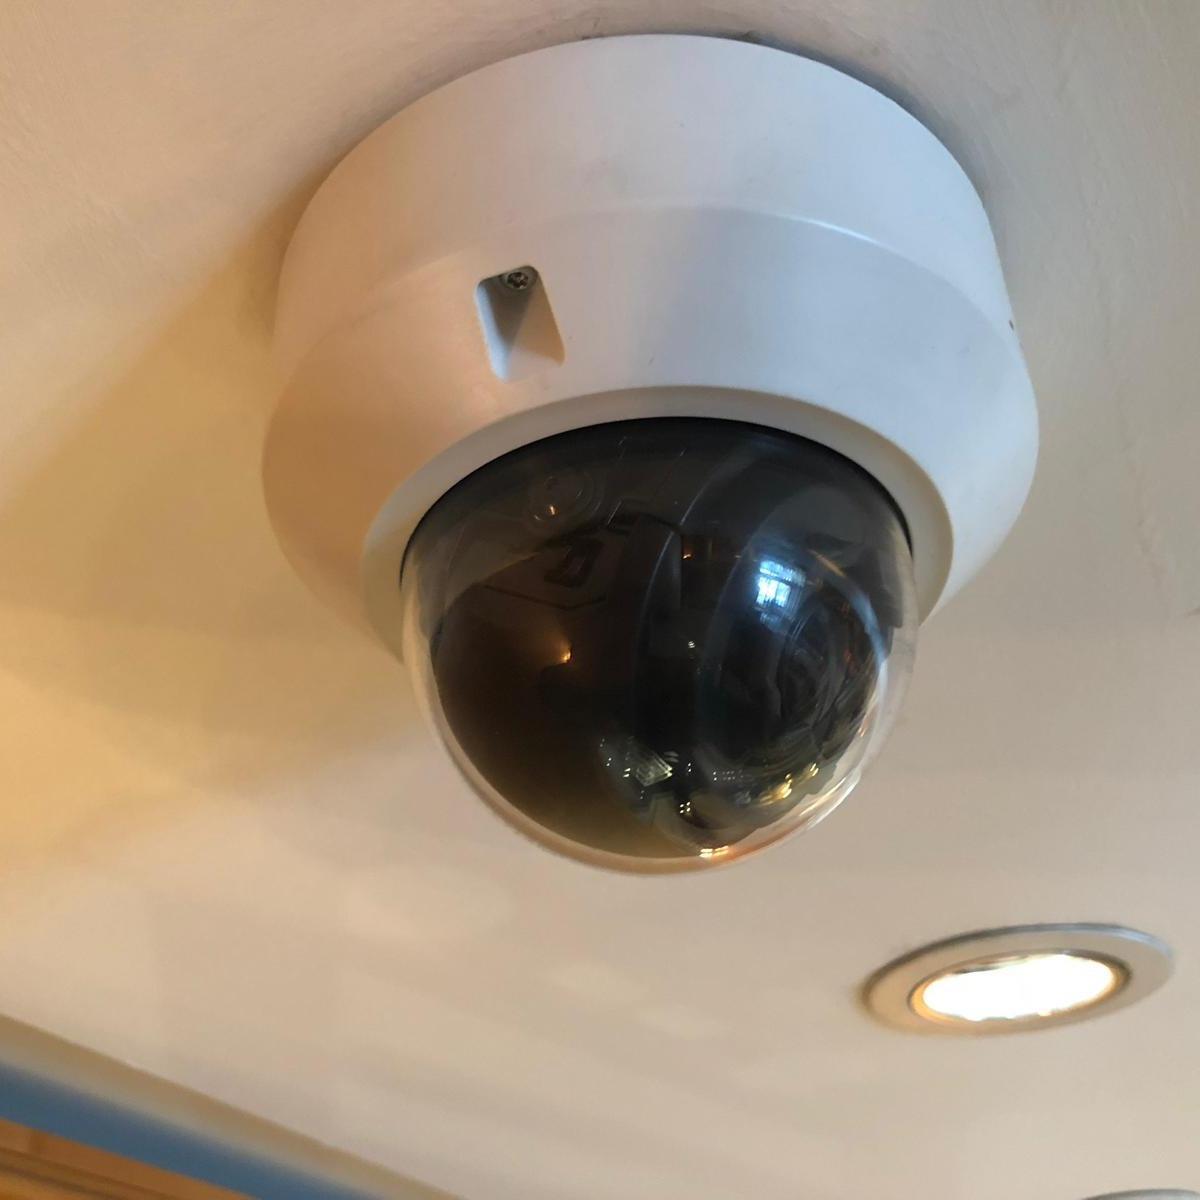 Commercial Security Cameras - Attrib Solution